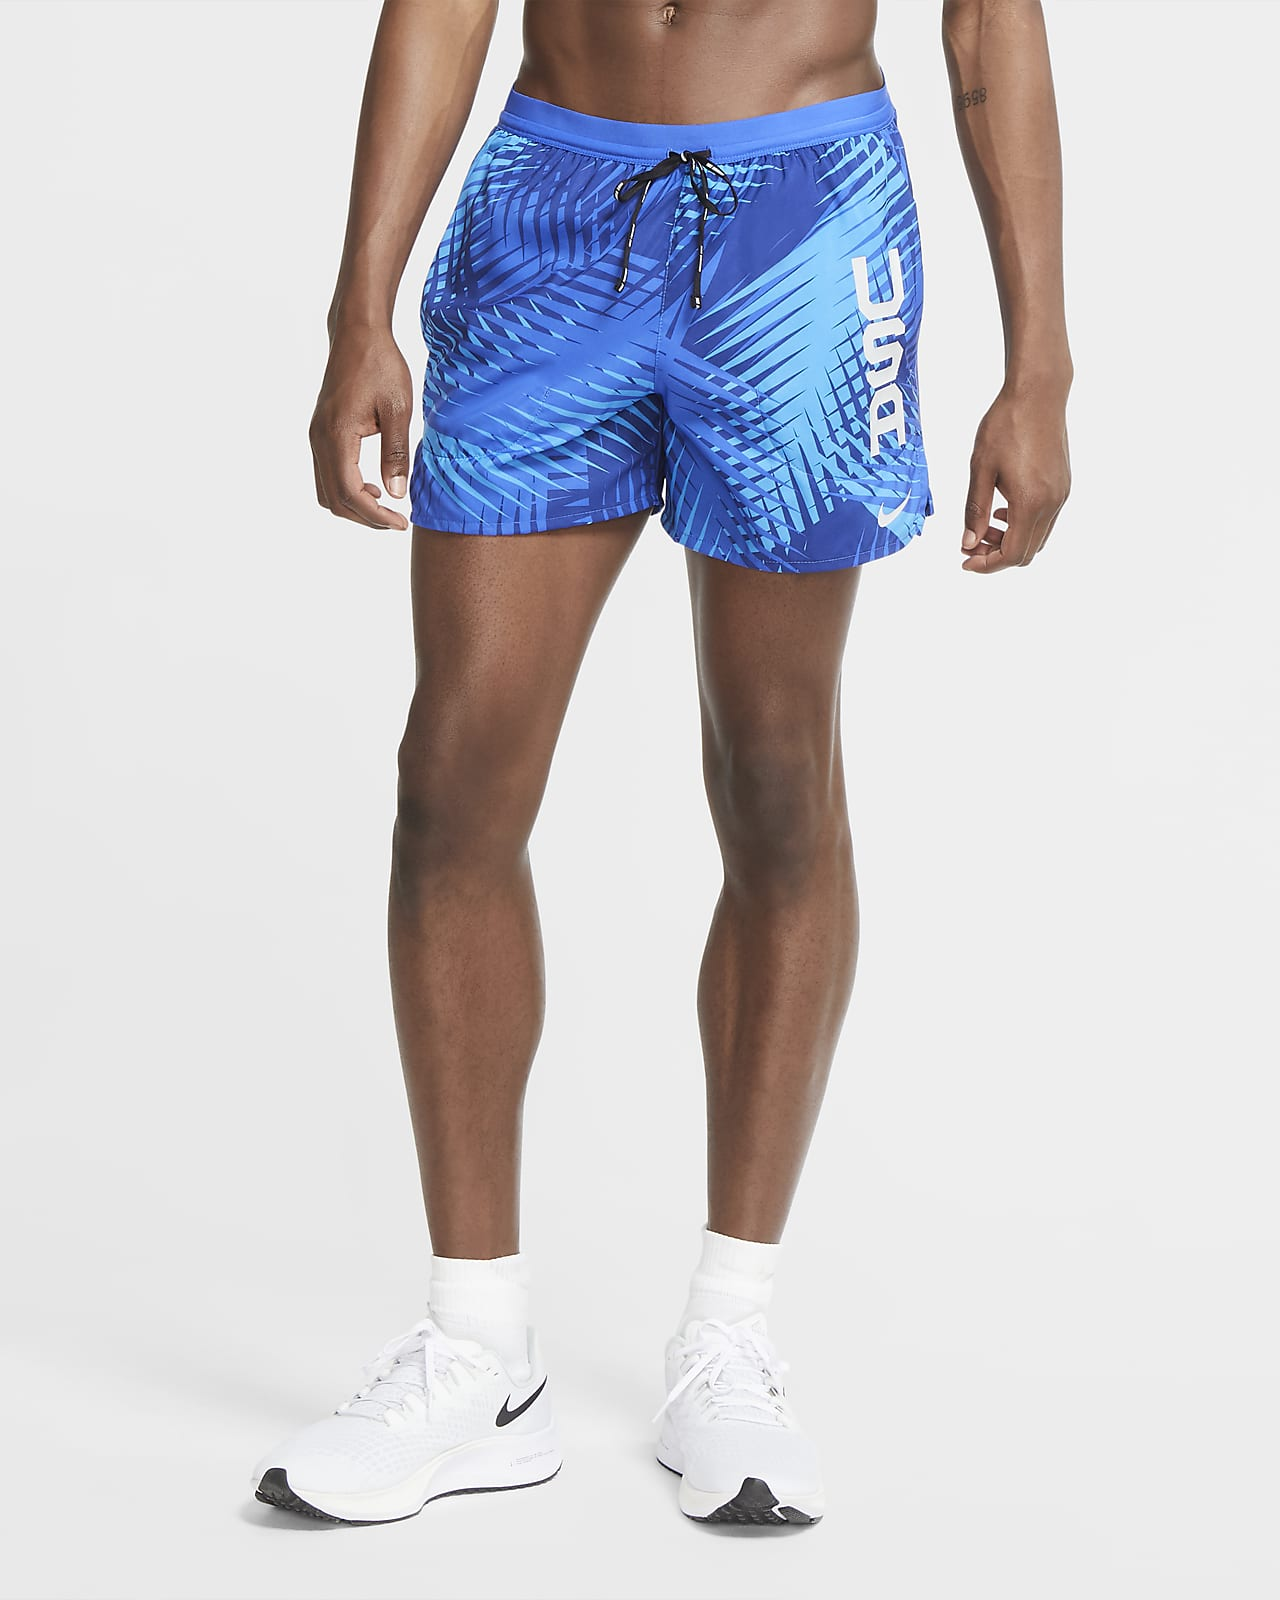 Short de running Nike Team USA Flex Stride pour Homme